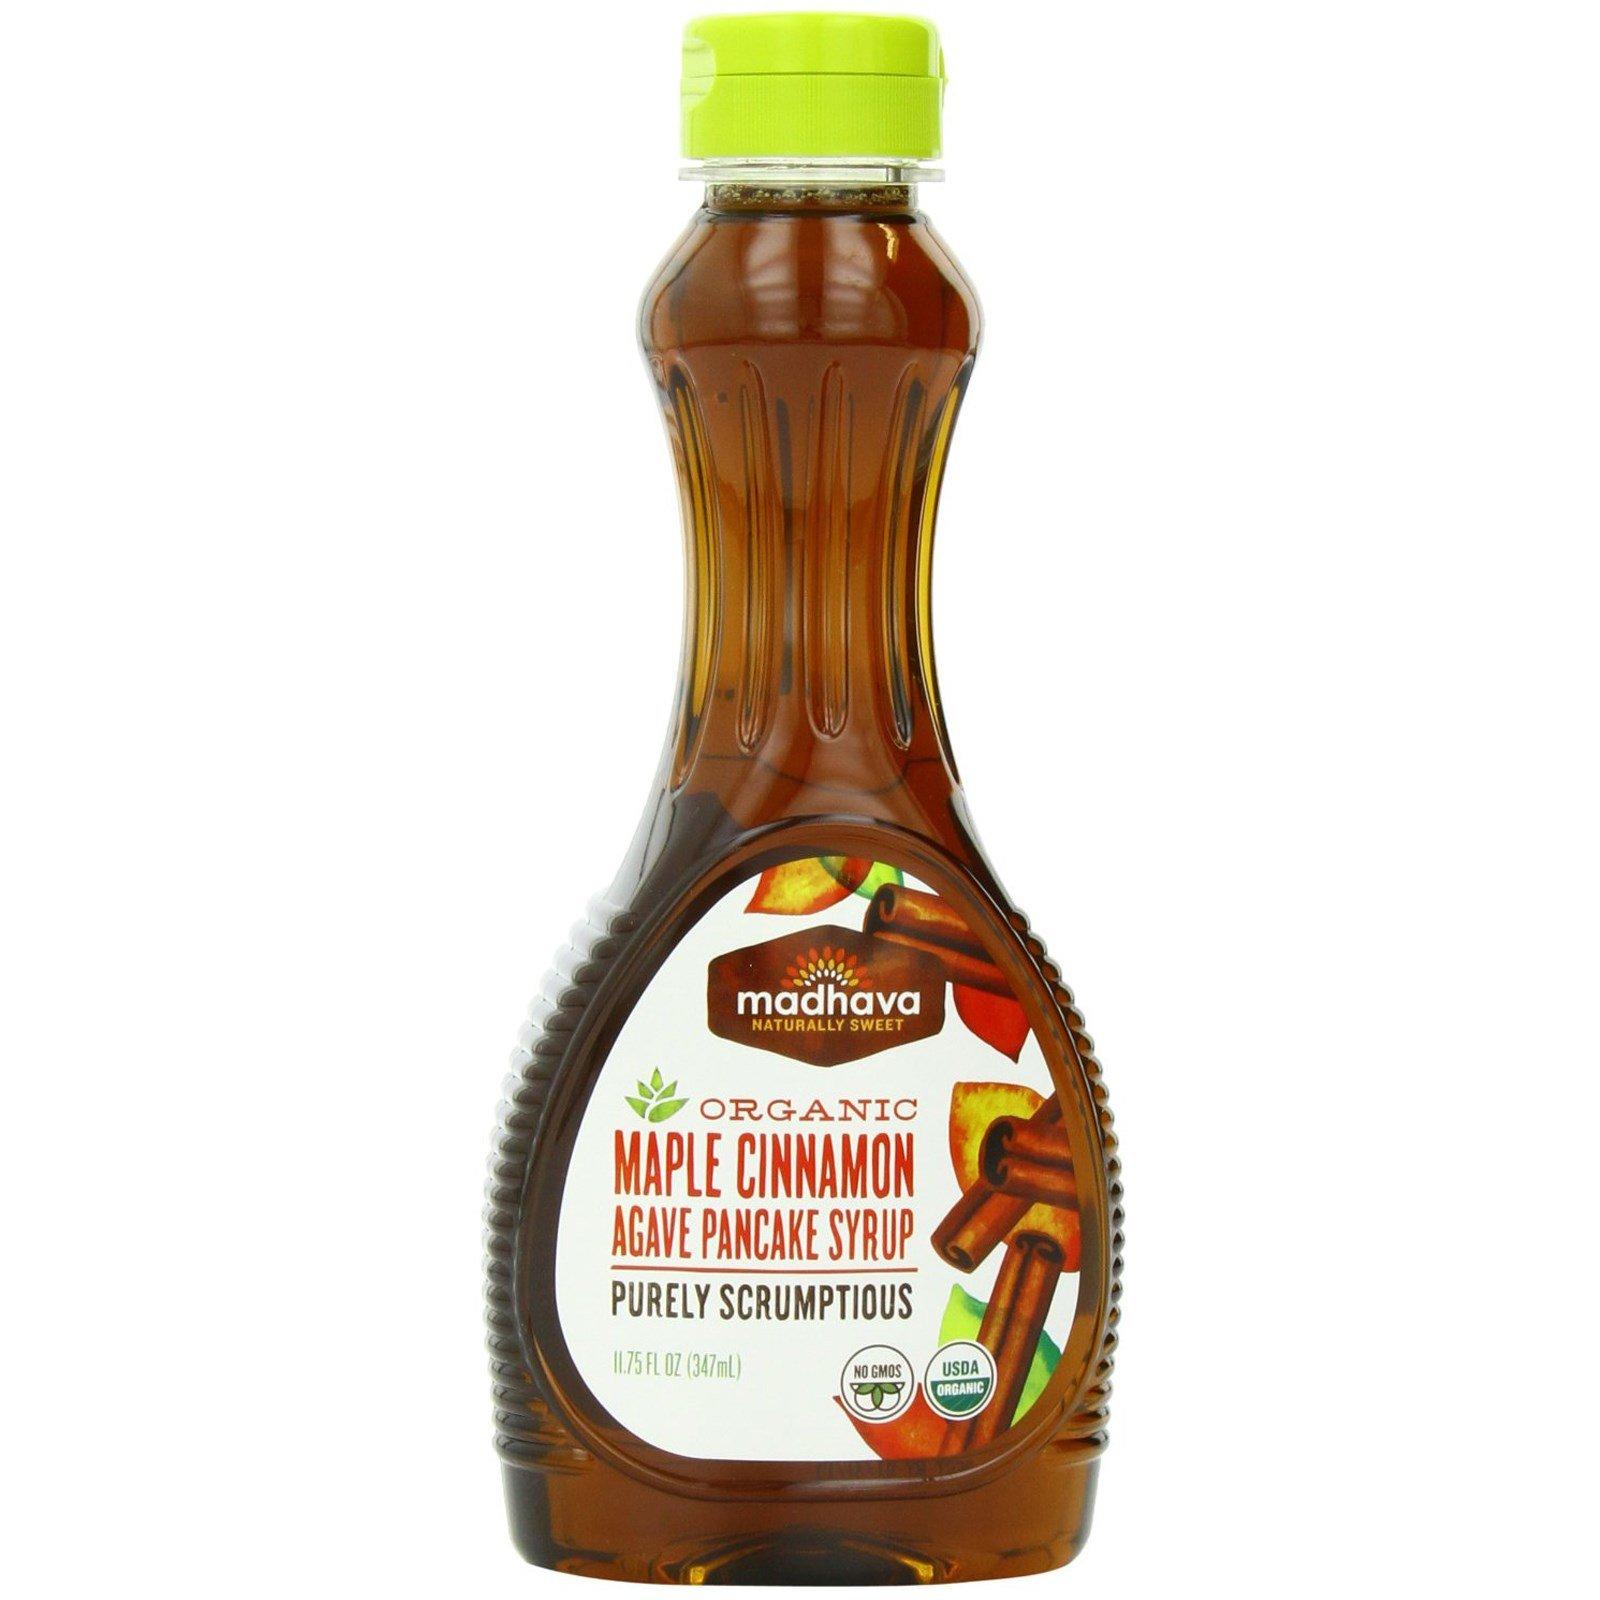 Madhava Natural Sweeteners, Organic Maple Cinnamon Agave Pancake Syrup, 11.75 fl oz (347 ml) Madhava Natural Sweeteners, Organic Maple Cinnamon Agave Pancake Syrup, 11.75 fl oz (347 ml) - 2pcs